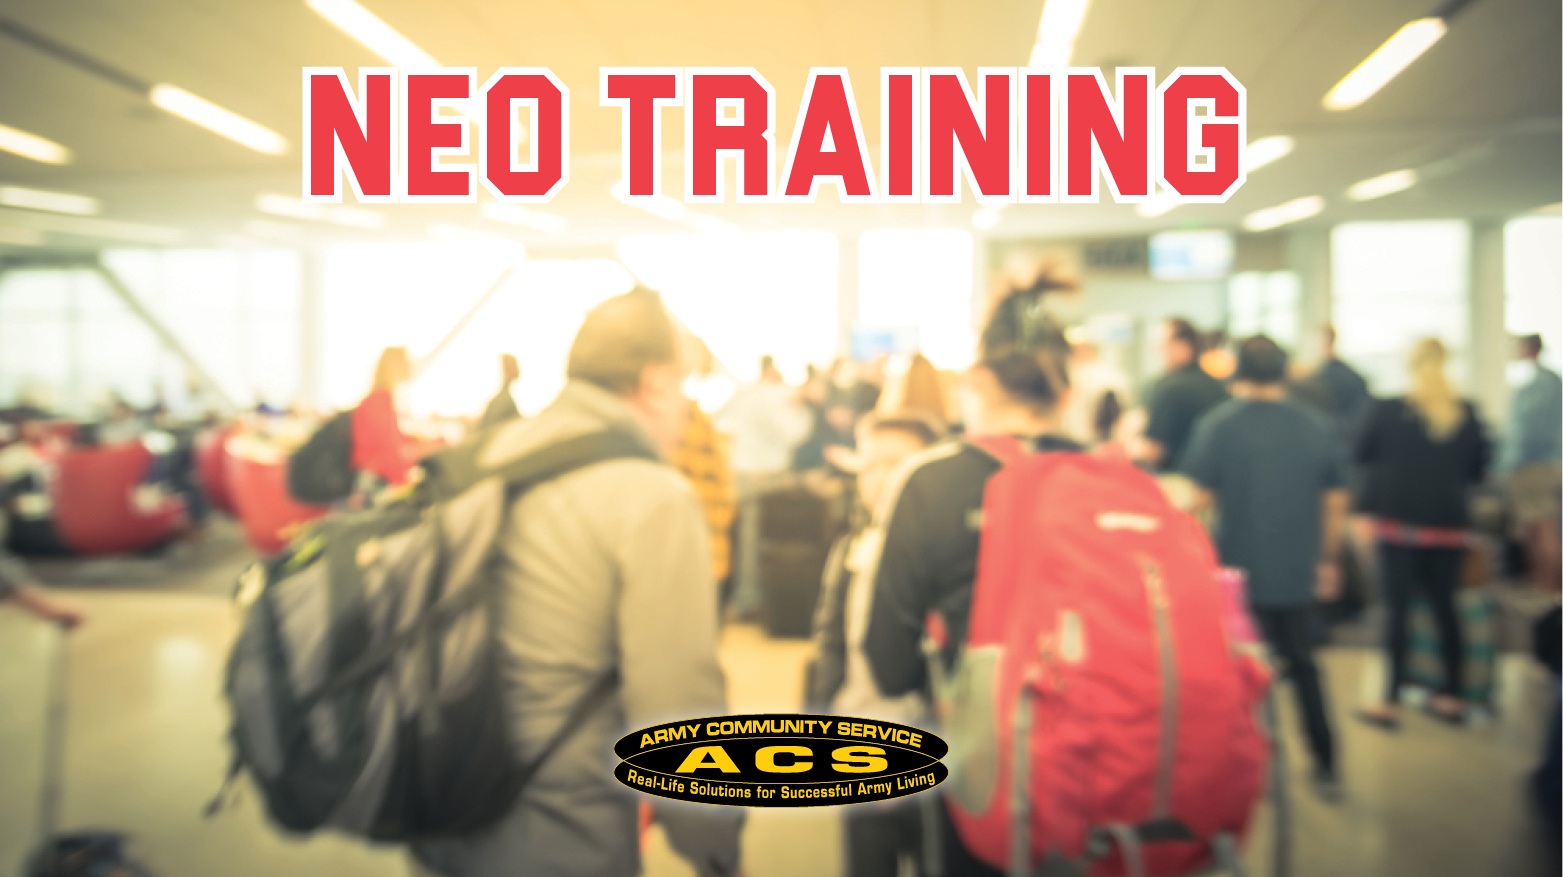 NEO Training